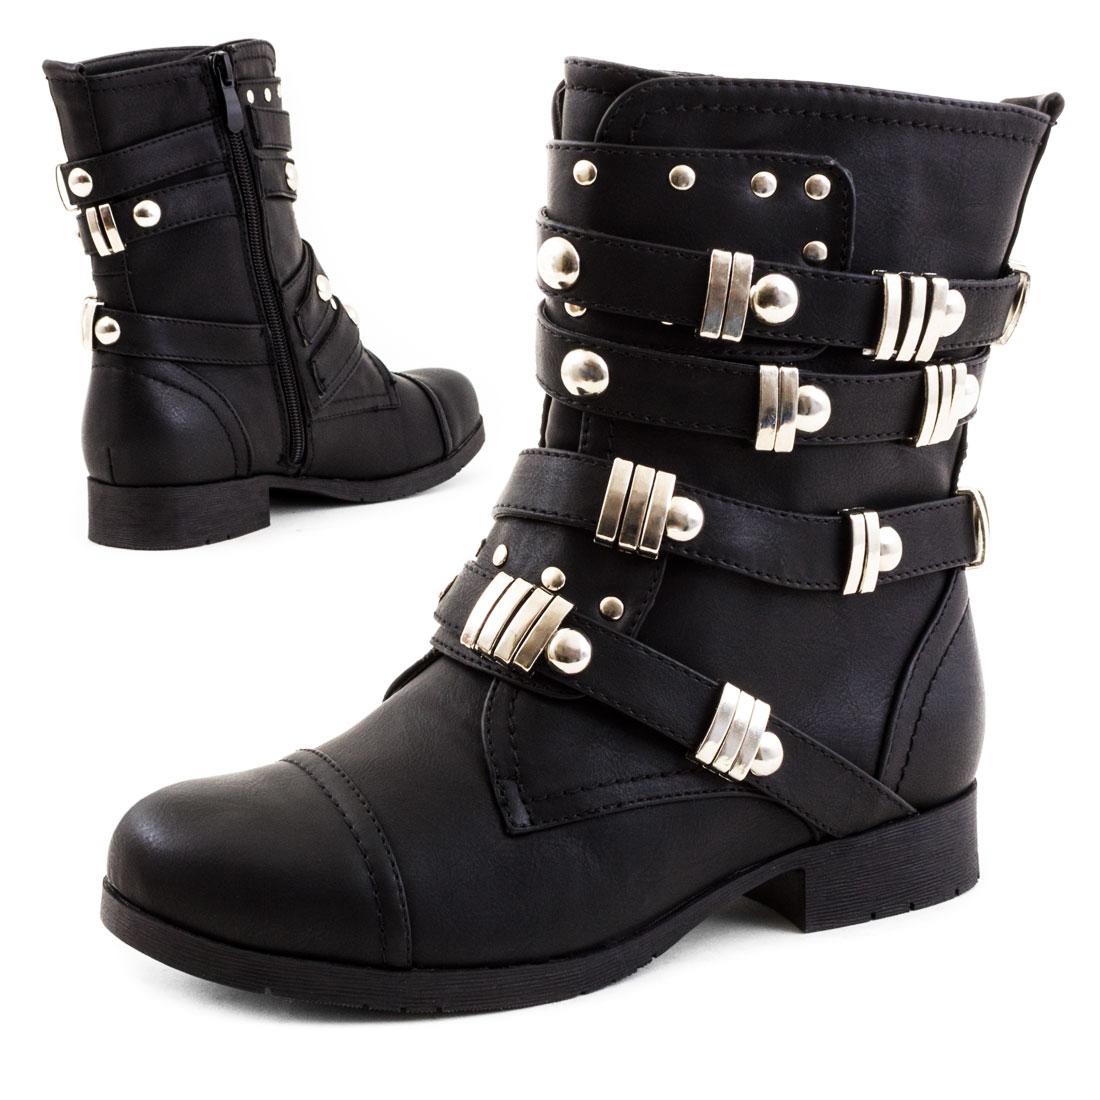 neu damen worker boots nieten stiefel stiefeletten schuhe. Black Bedroom Furniture Sets. Home Design Ideas